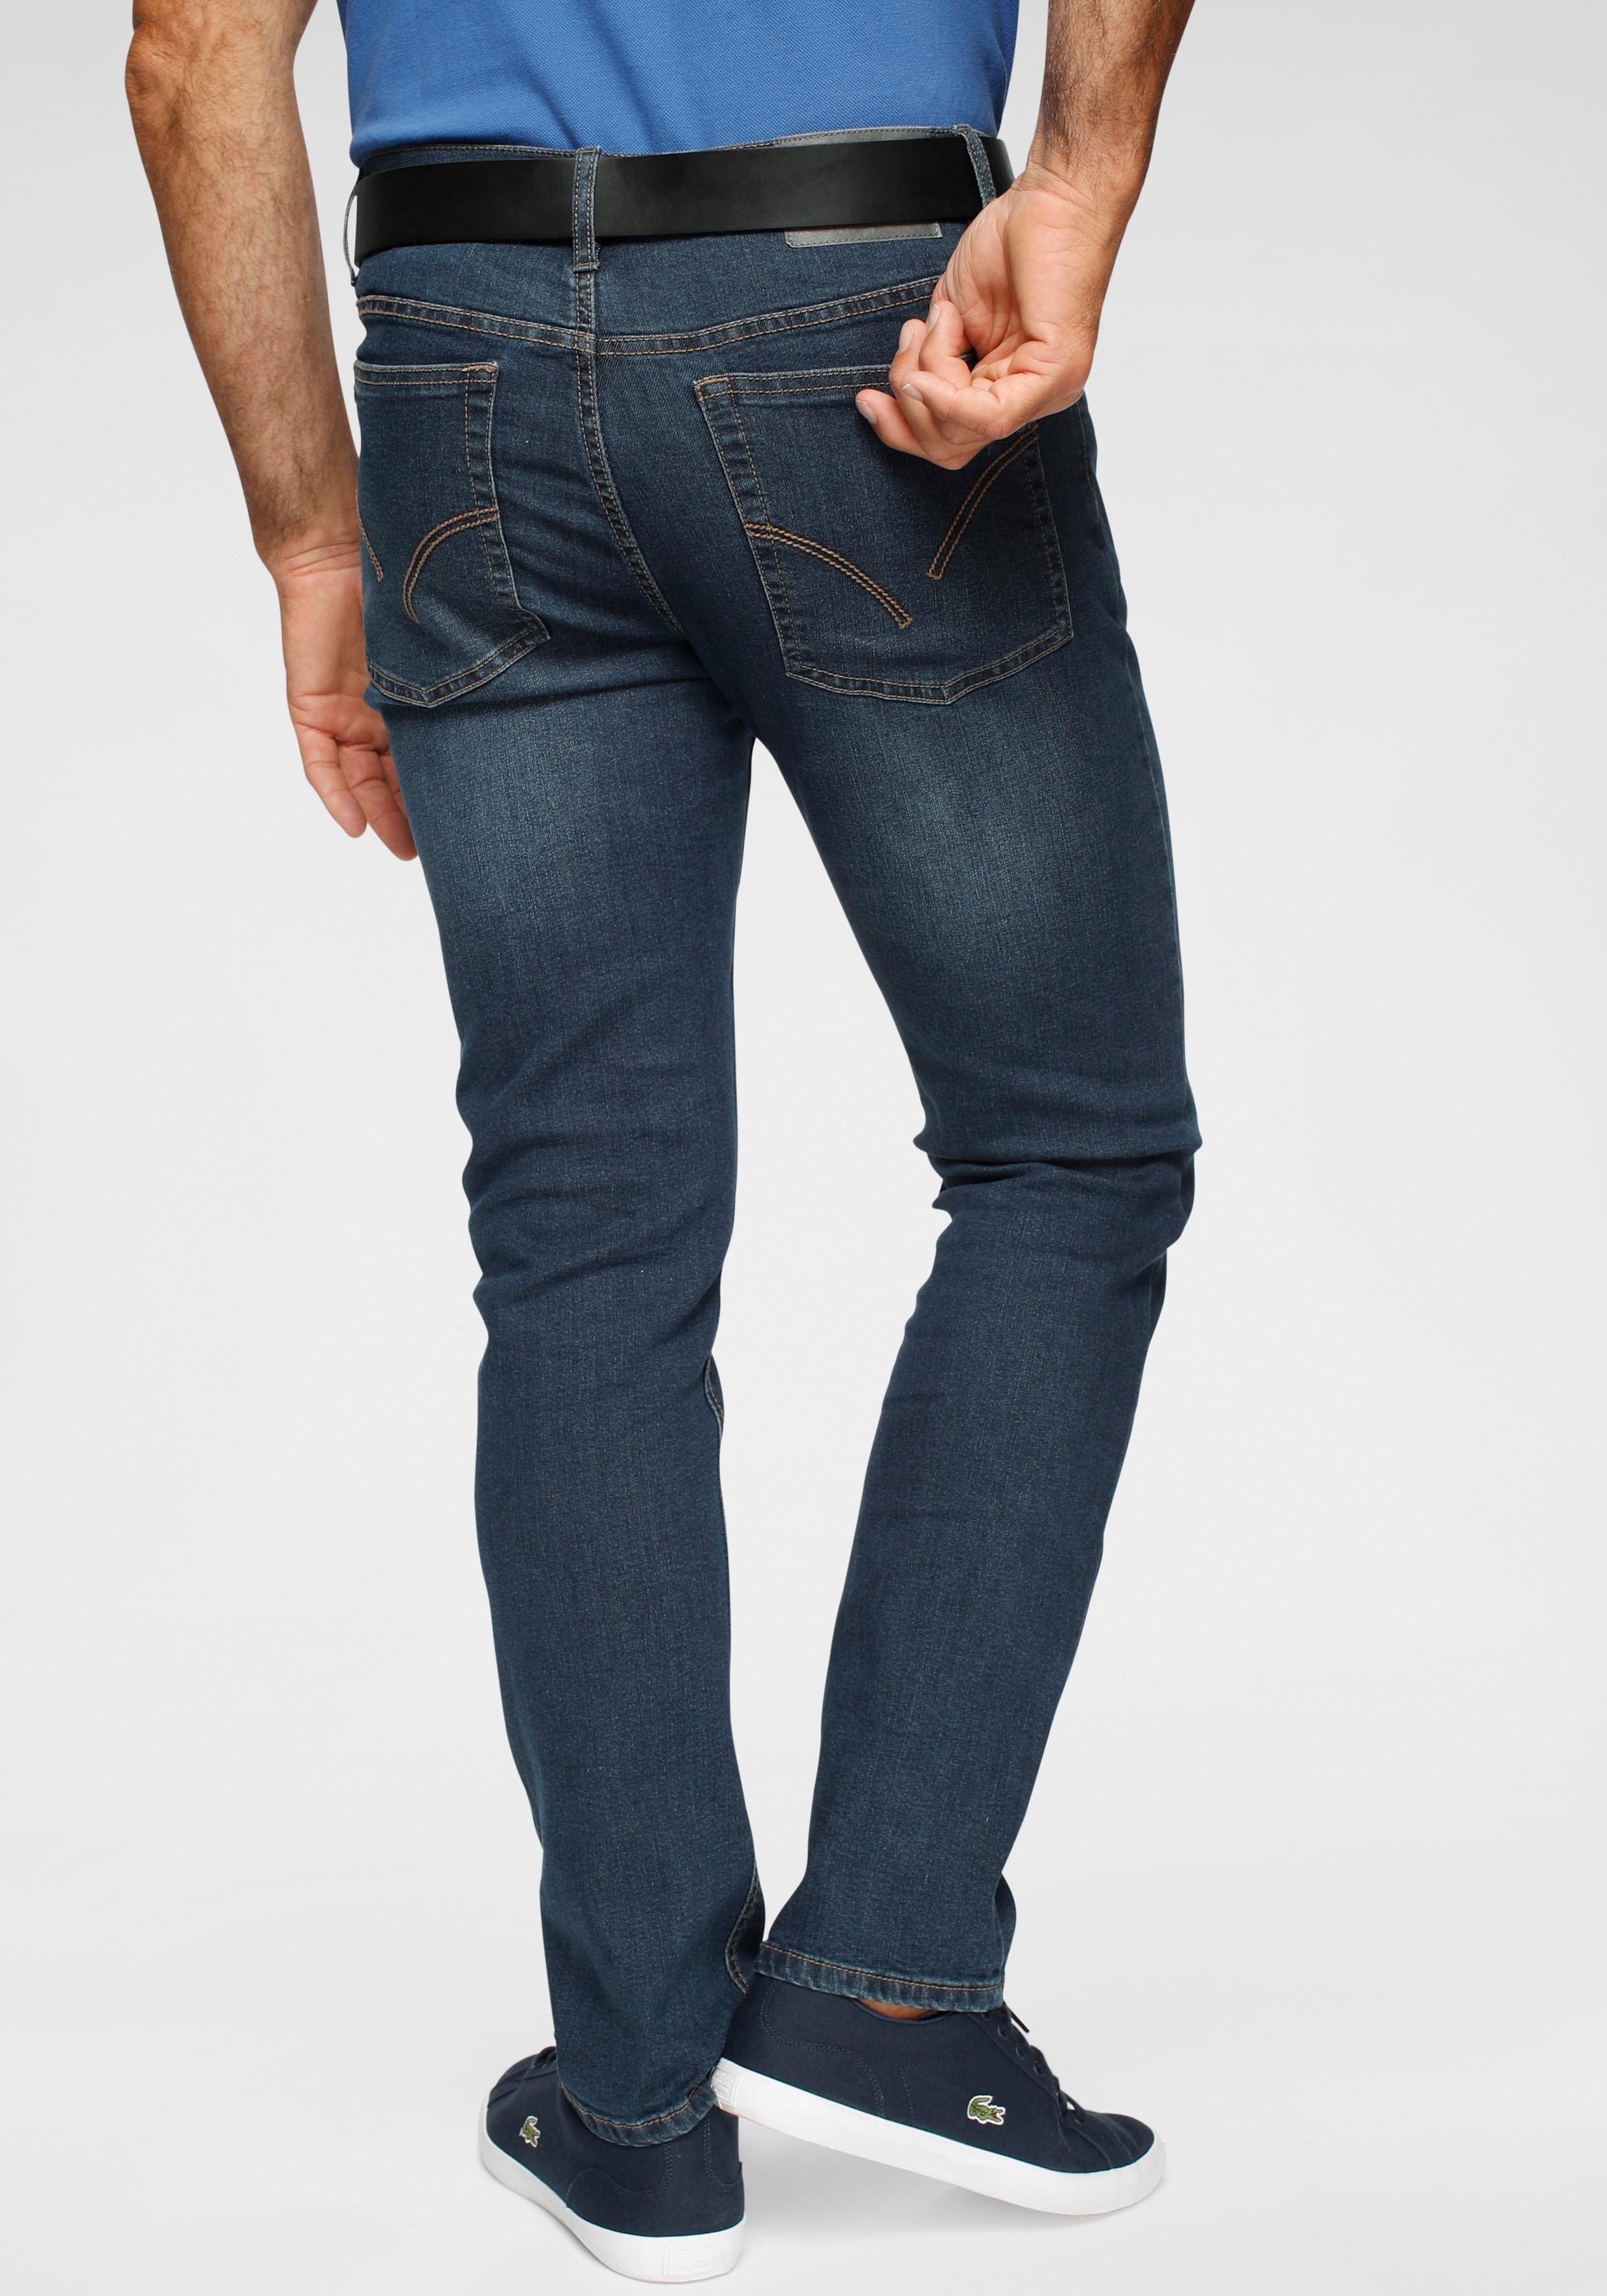 ARIZONA straight jeans - gratis ruilen op otto.nl